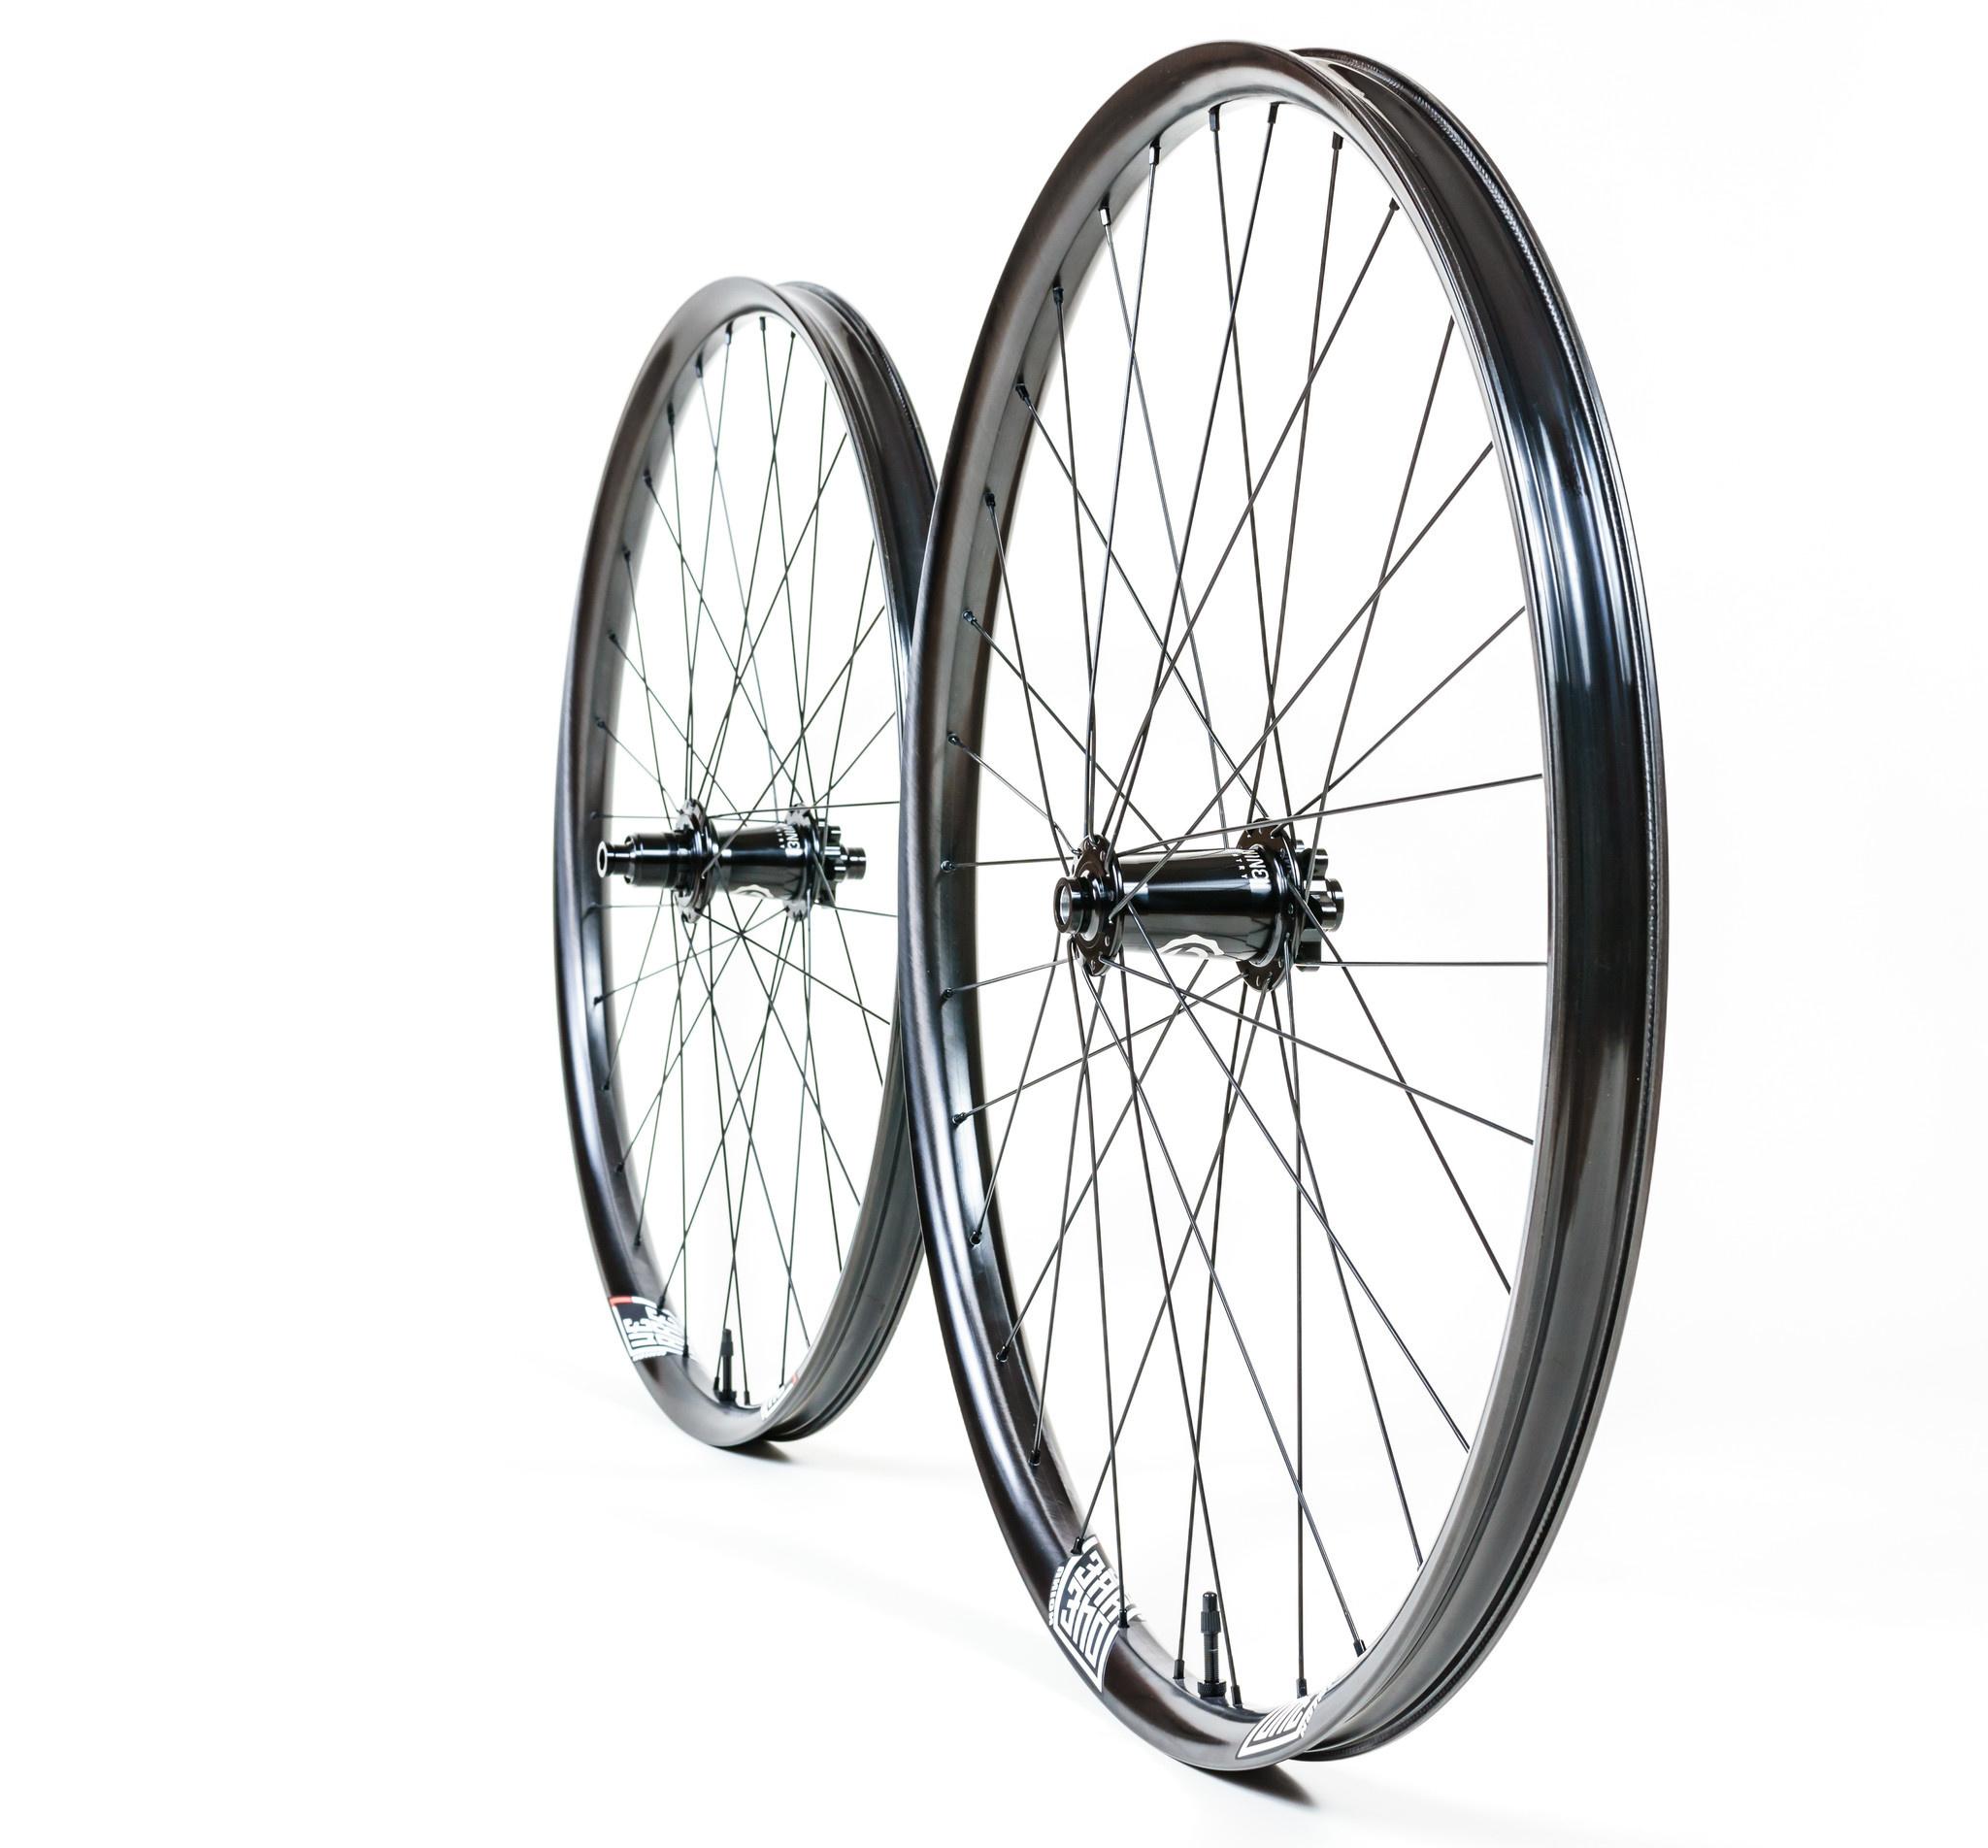 WR1 Wheelset Union 27.5, I9 1/1, Black, Boost 148 x 12, Sram XD, 6-Bolt Black Sapim Race-1